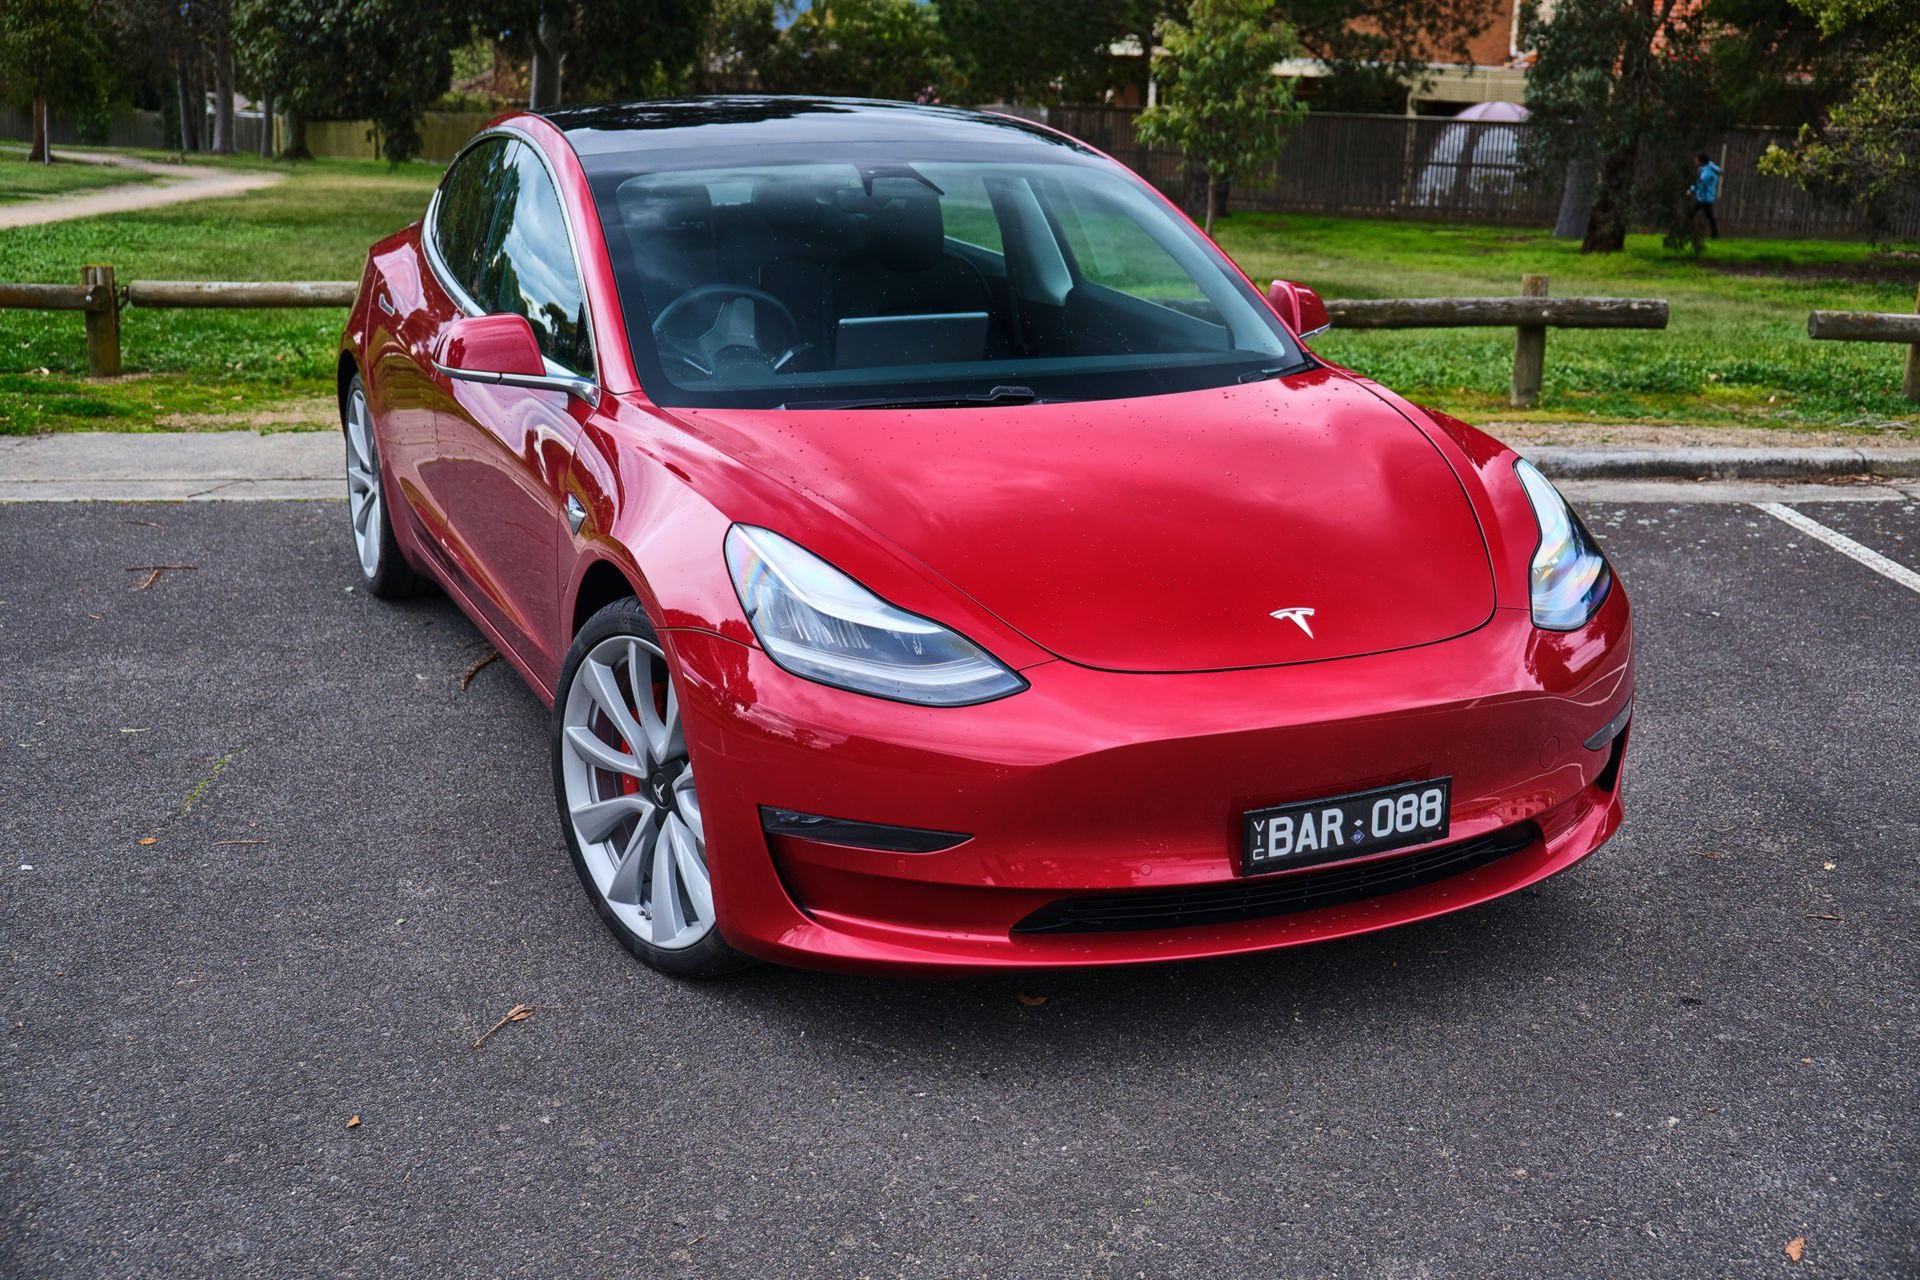 Doanh số của Tesla Model 3 chấp tất cả các dòng xe con của BMW cộng lại - 1